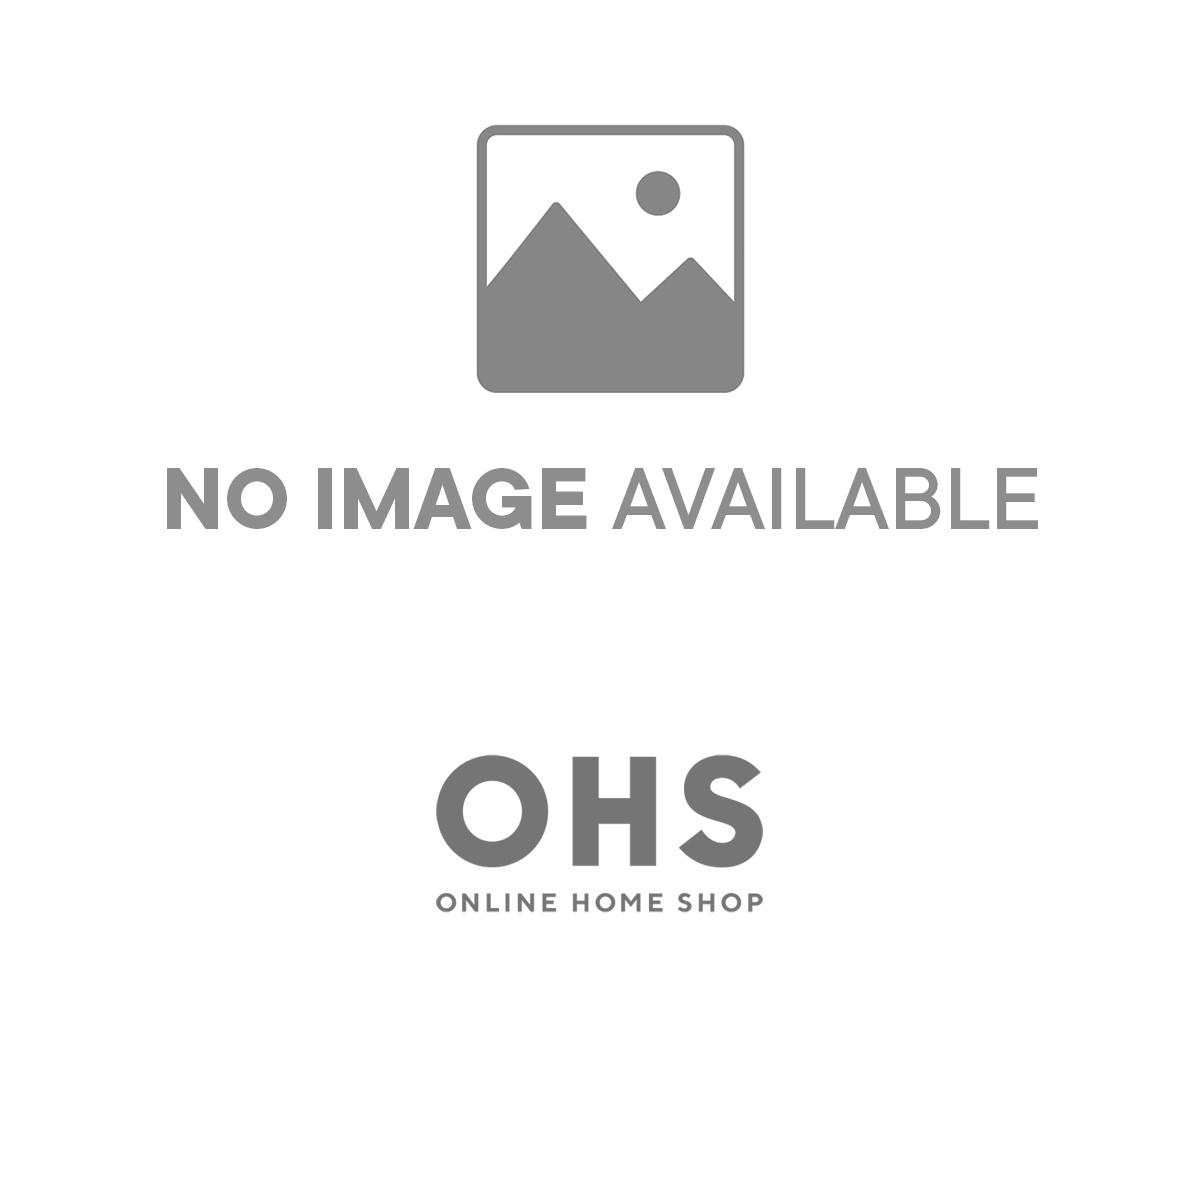 Rewind Duvet Cover Set - Grey